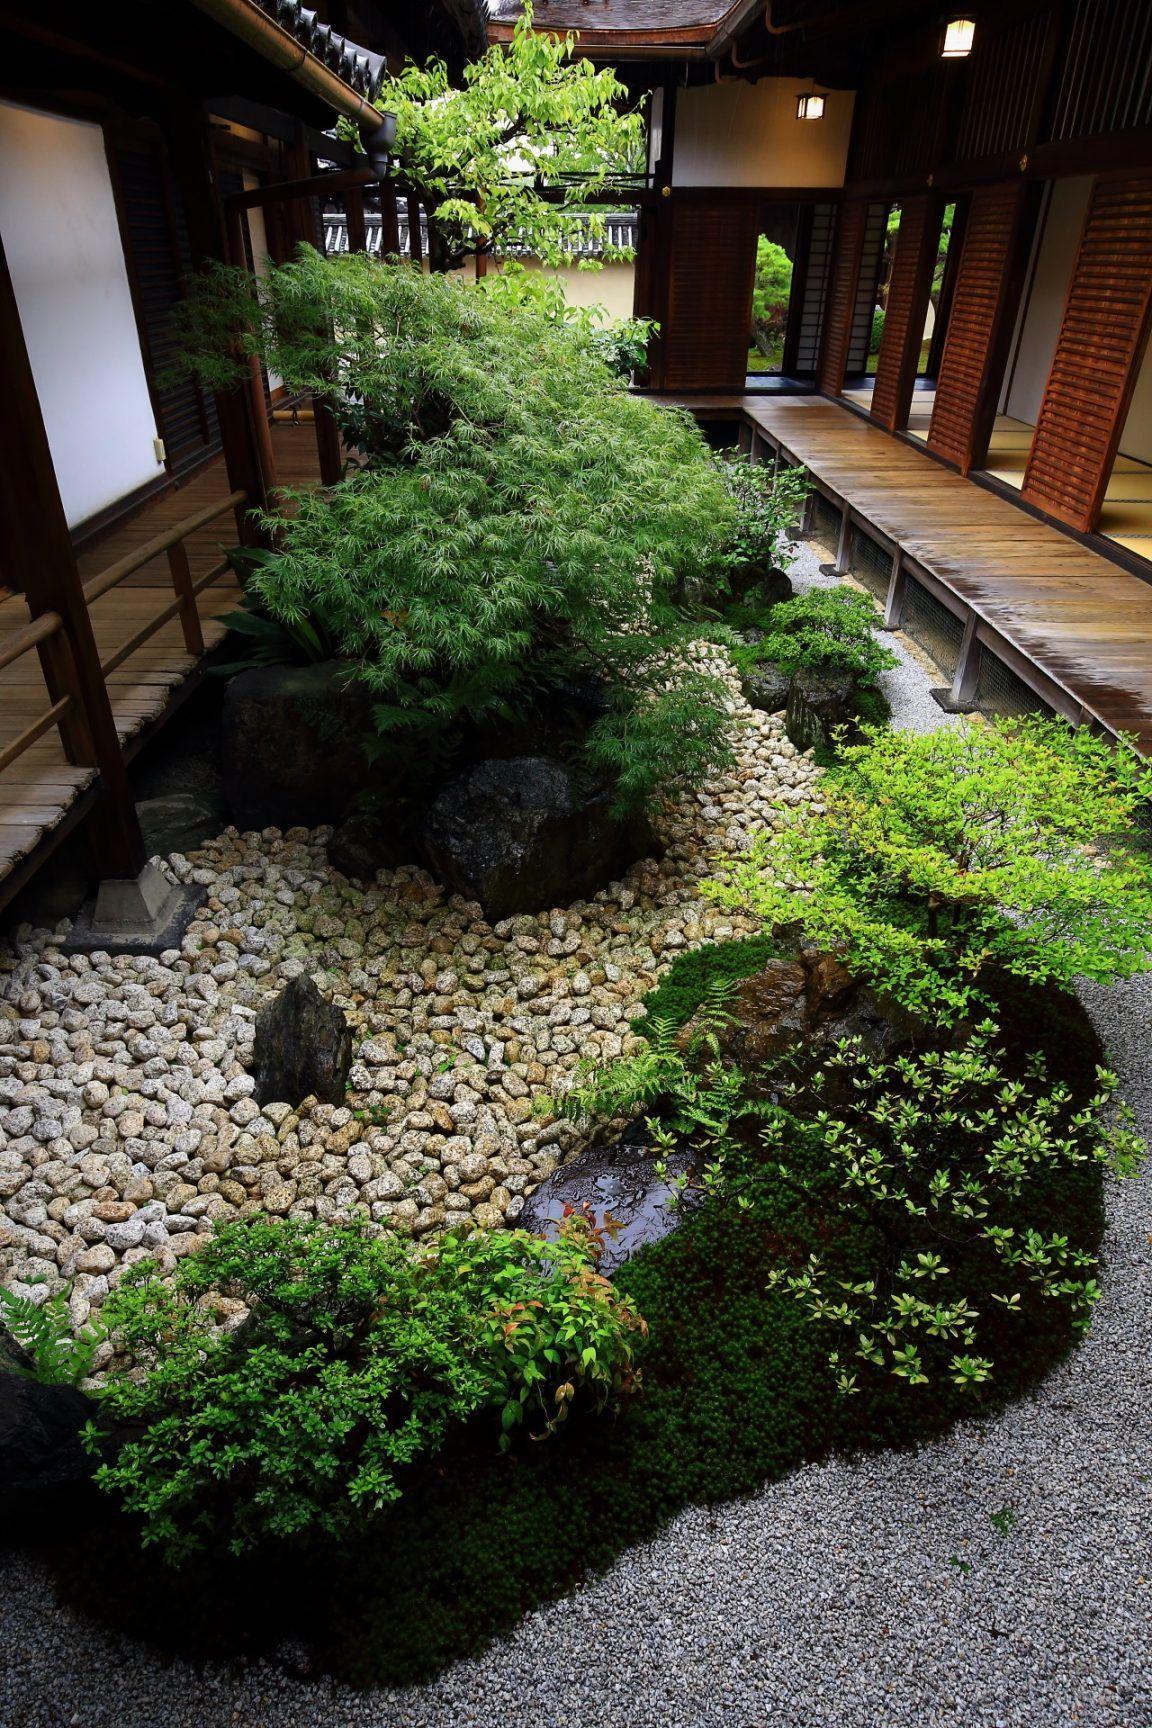 35 Fascinating Japanese Garden Design Ideas Page 23 Of 35 Gardenholic Japanesegarden Japanese Garden Landscape Japan Garden Japanese Garden